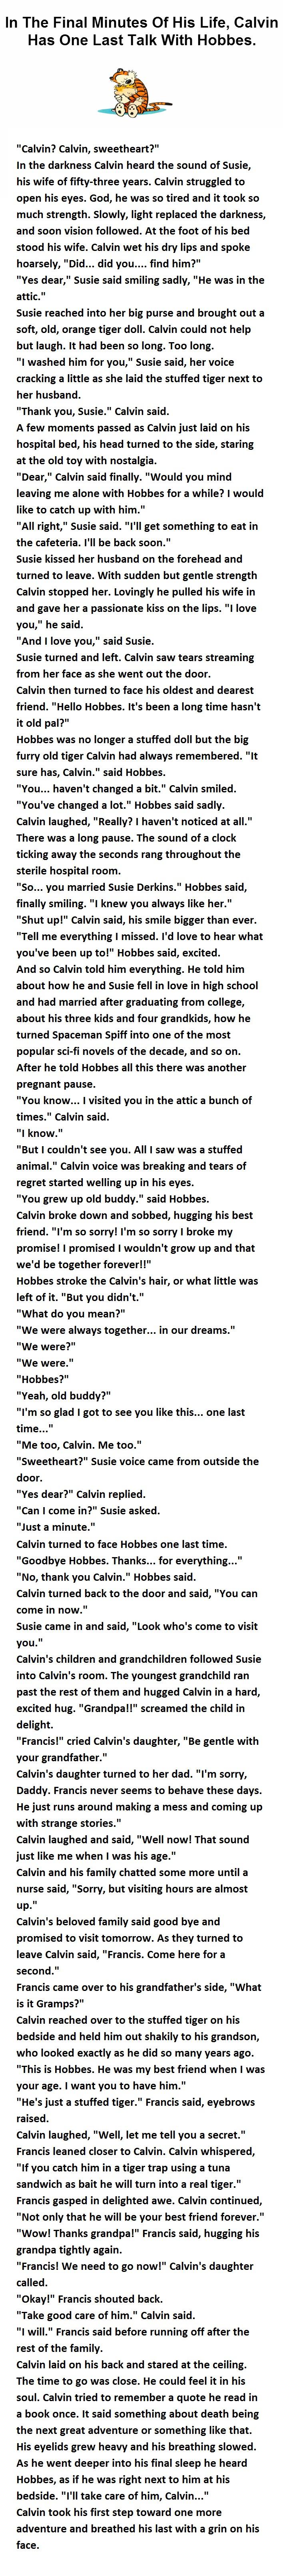 Calvin and Hobbes Grandchild - DadCAMP